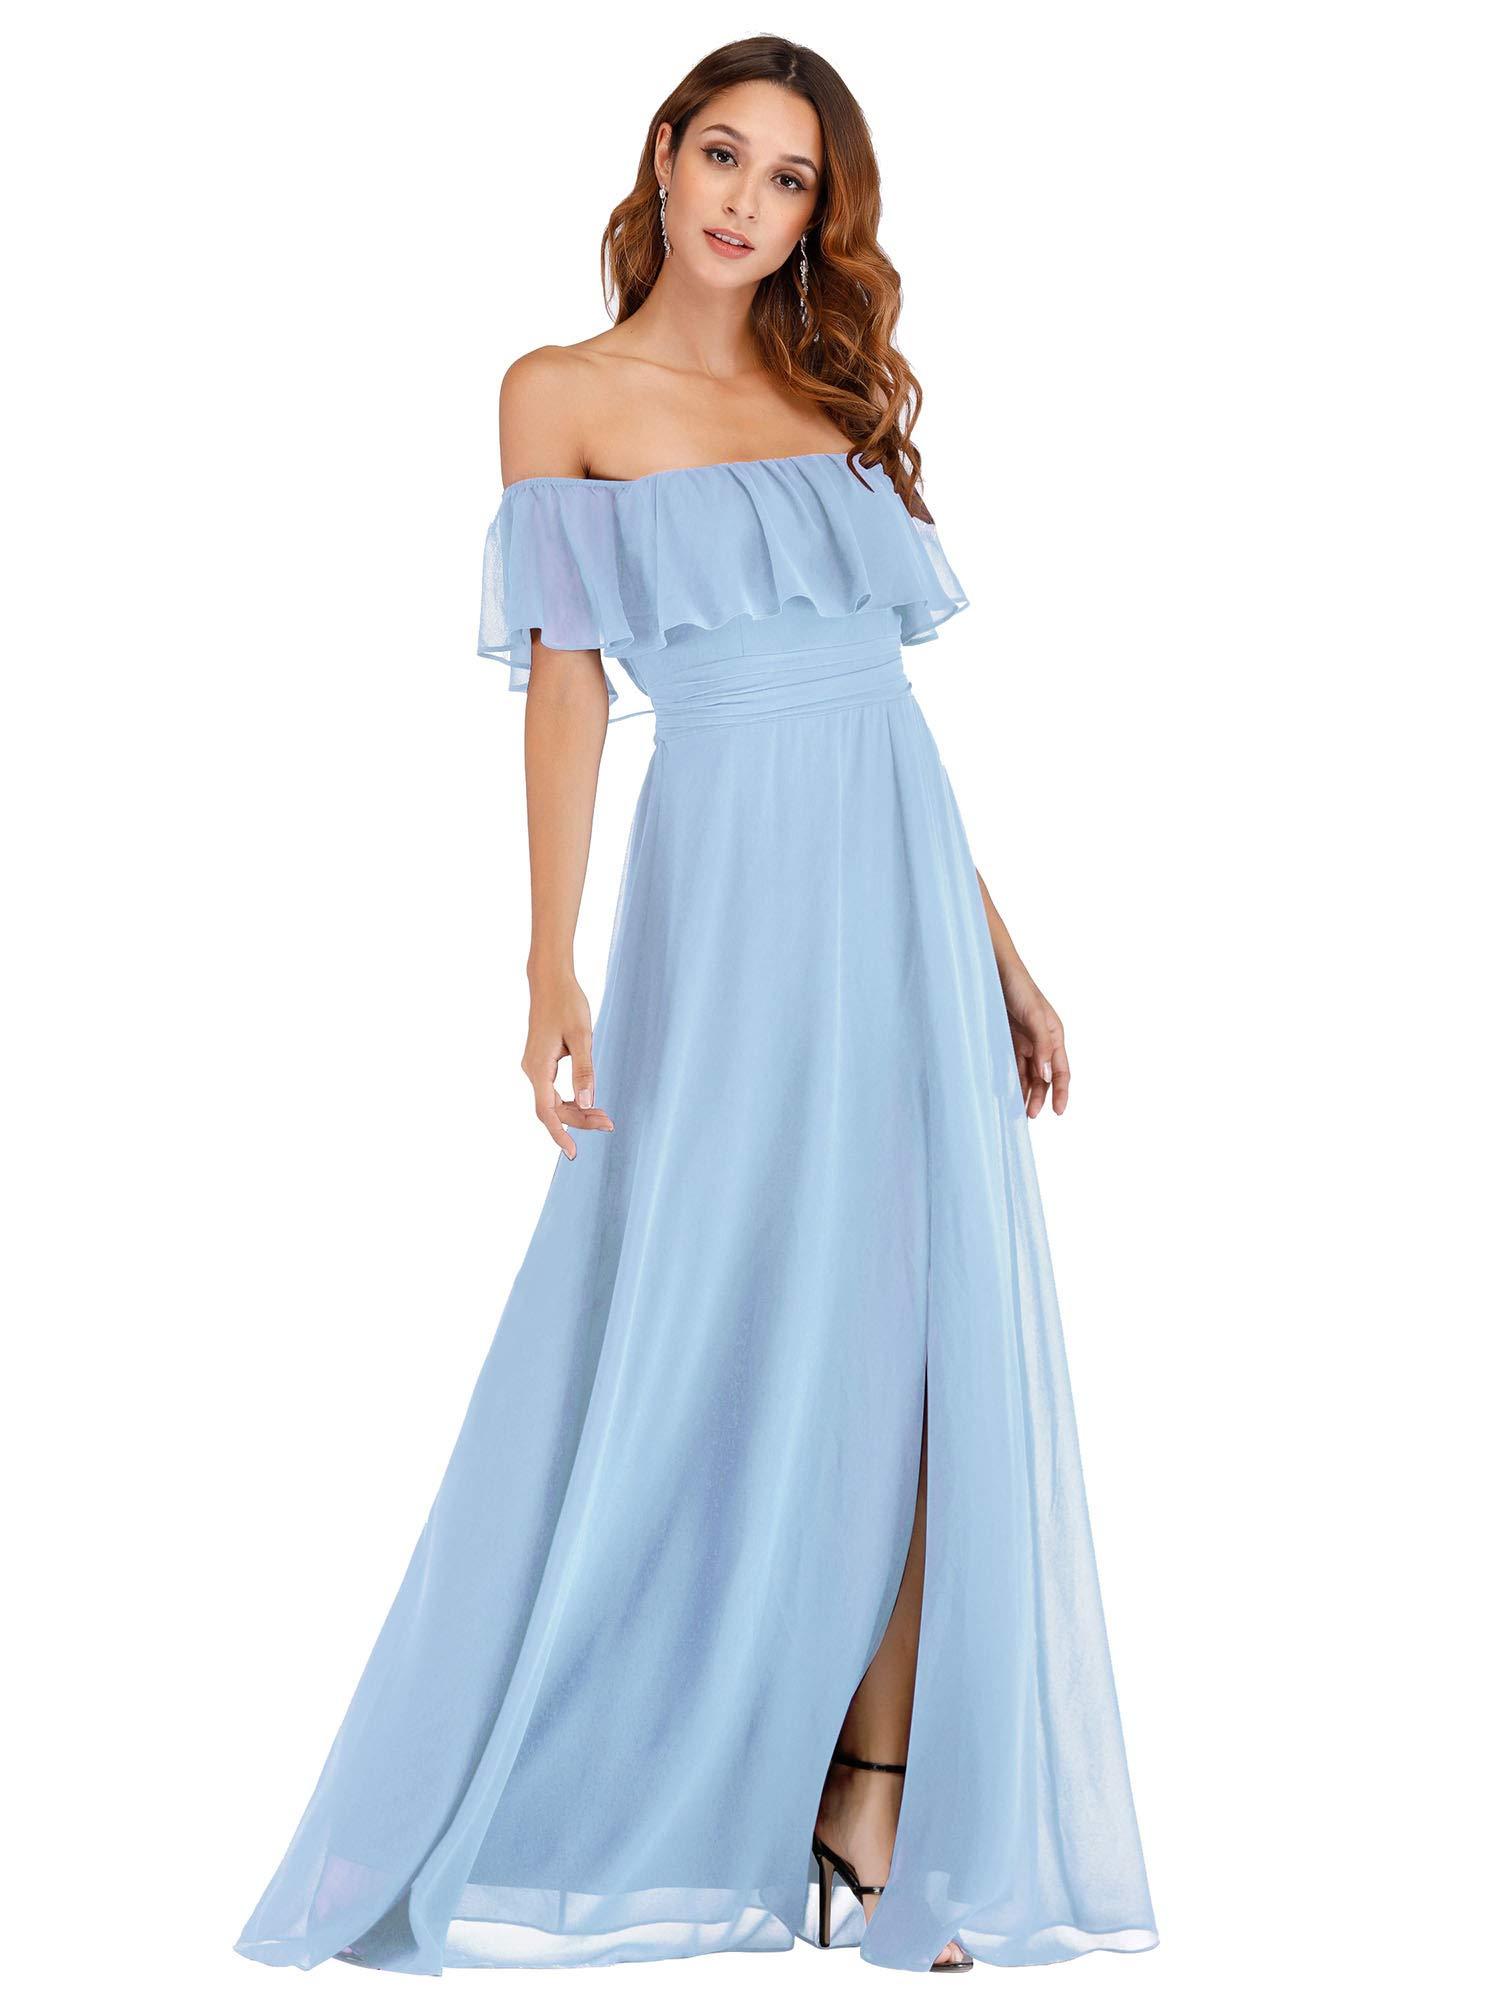 Womens Off Shoulder Ruffle Elegant Dress Wedding Guest Dress For Women Blue Us6